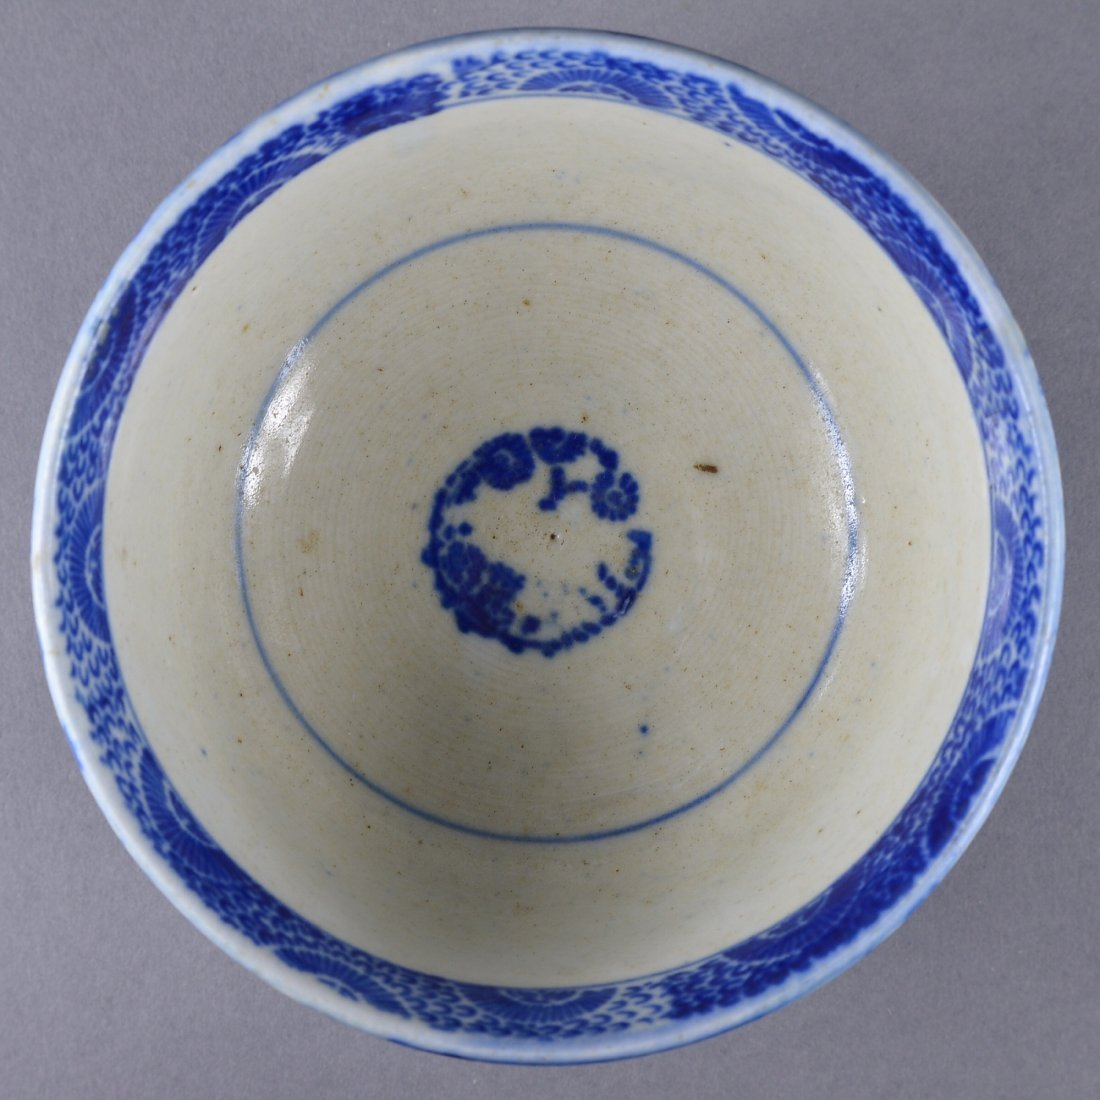 332: Chinese Minguo Blue & White Porcelain Bowl - 2